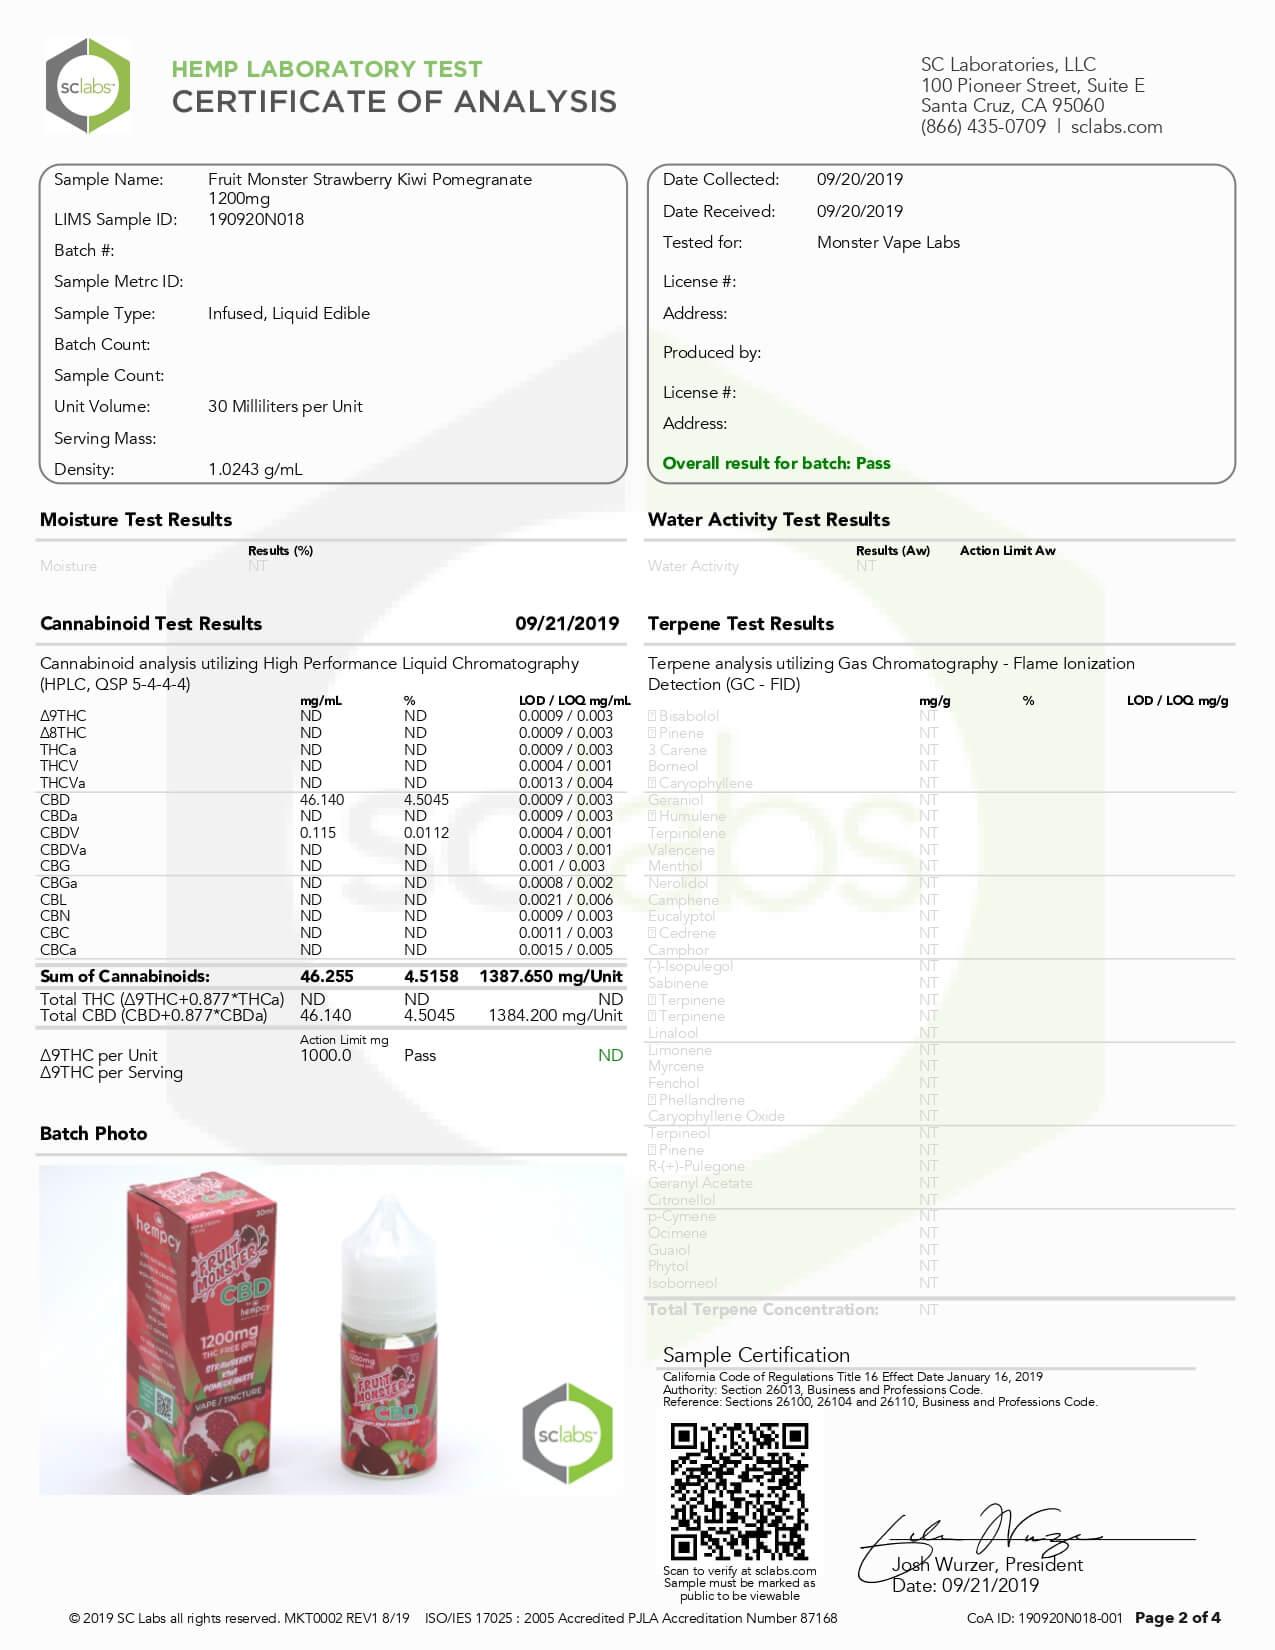 Fruit Monster CBD Vape Strawberry Kiwi Pomegranate 1200mg Lab Report